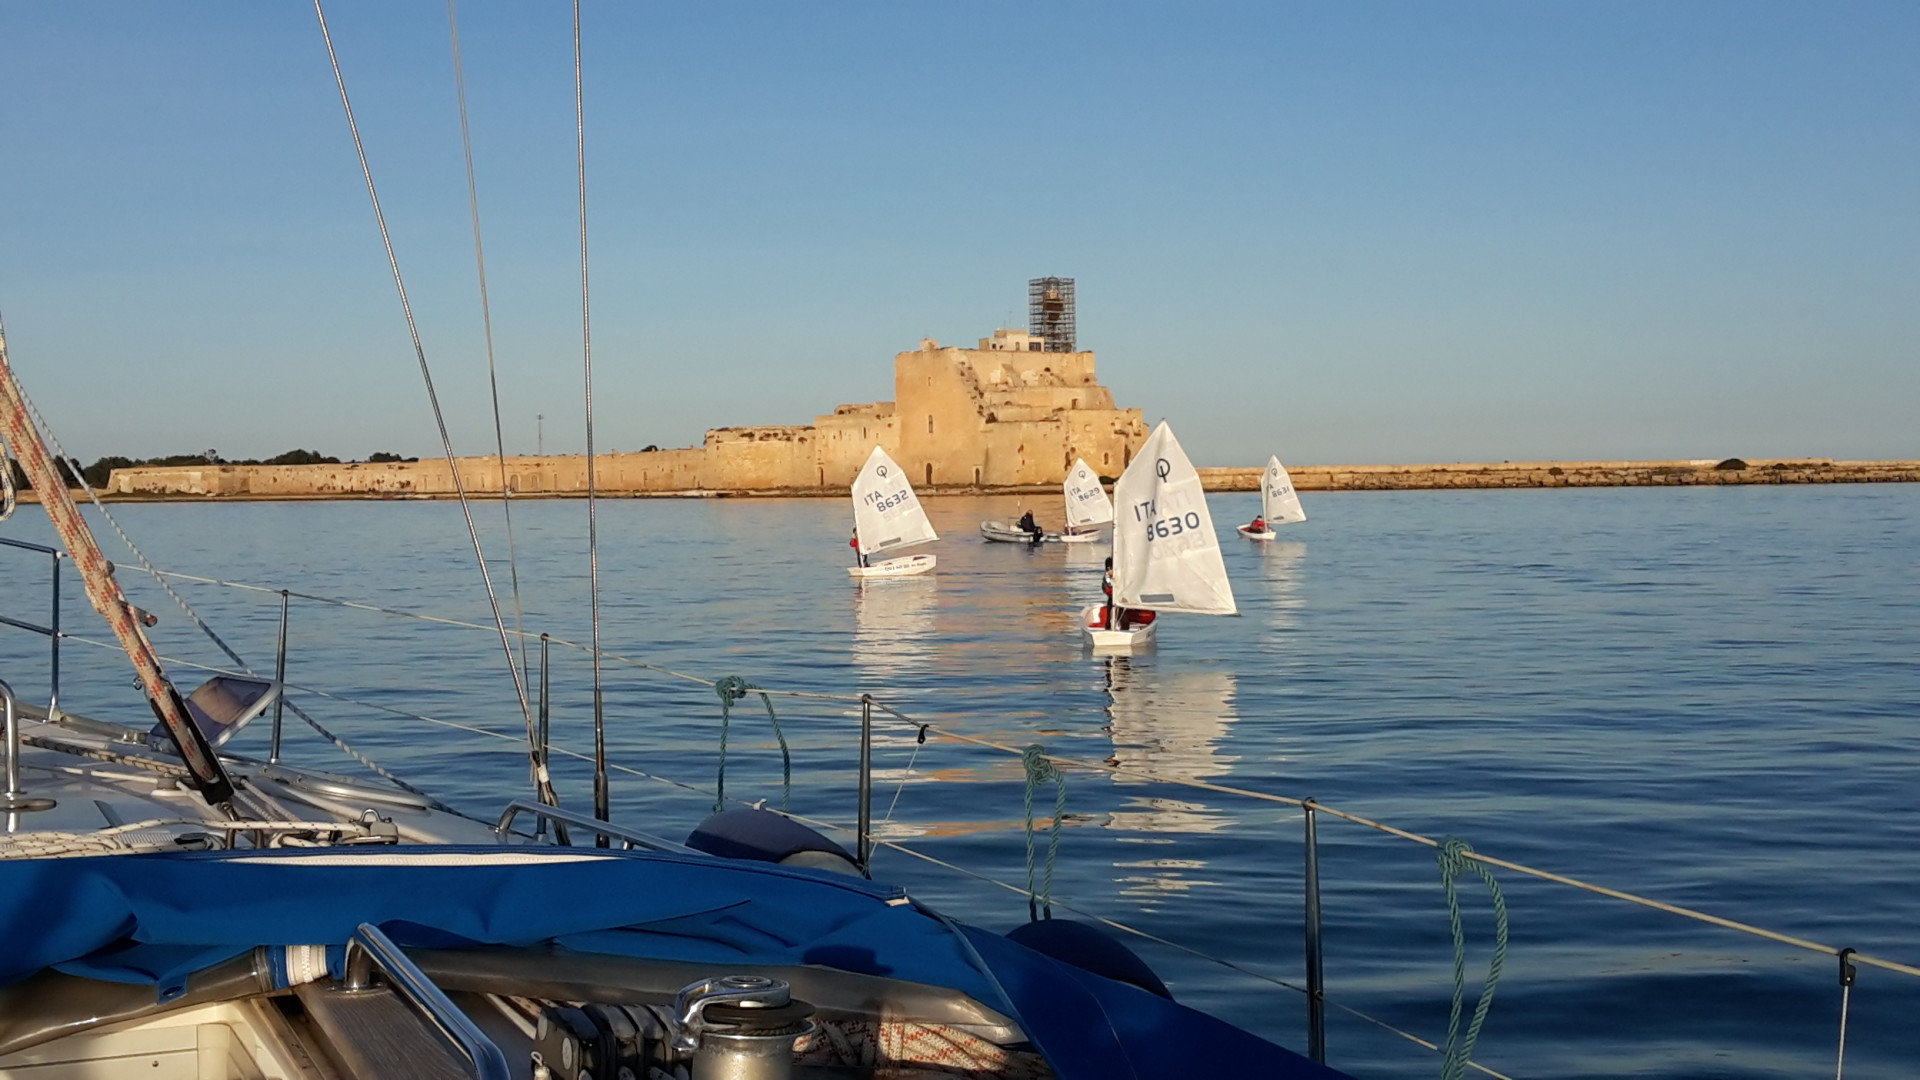 Scuola-di-vela-lega-navale-LNI-Brindisi (14)